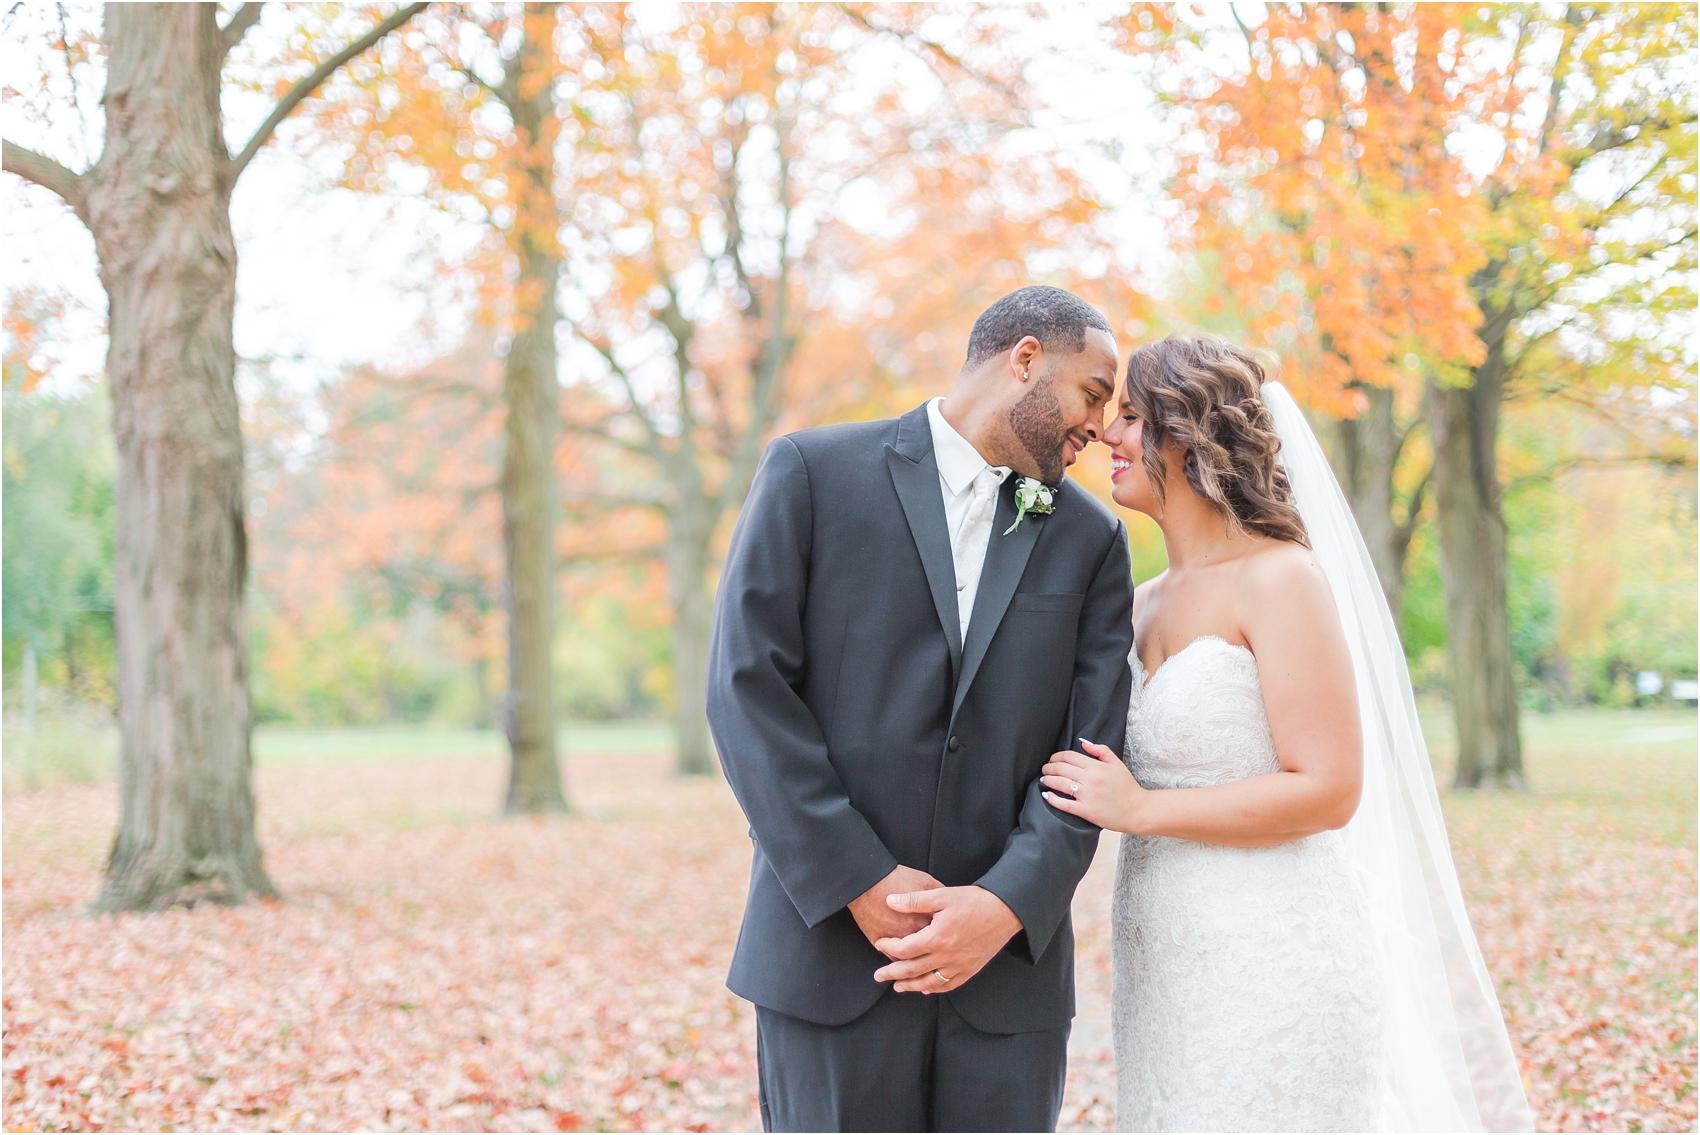 elegant-and-romantic-fall-wedding-photos-at-st-marys-catholic-church-in-monroe-michigan-by-courtney-carolyn-photography_0049.jpg